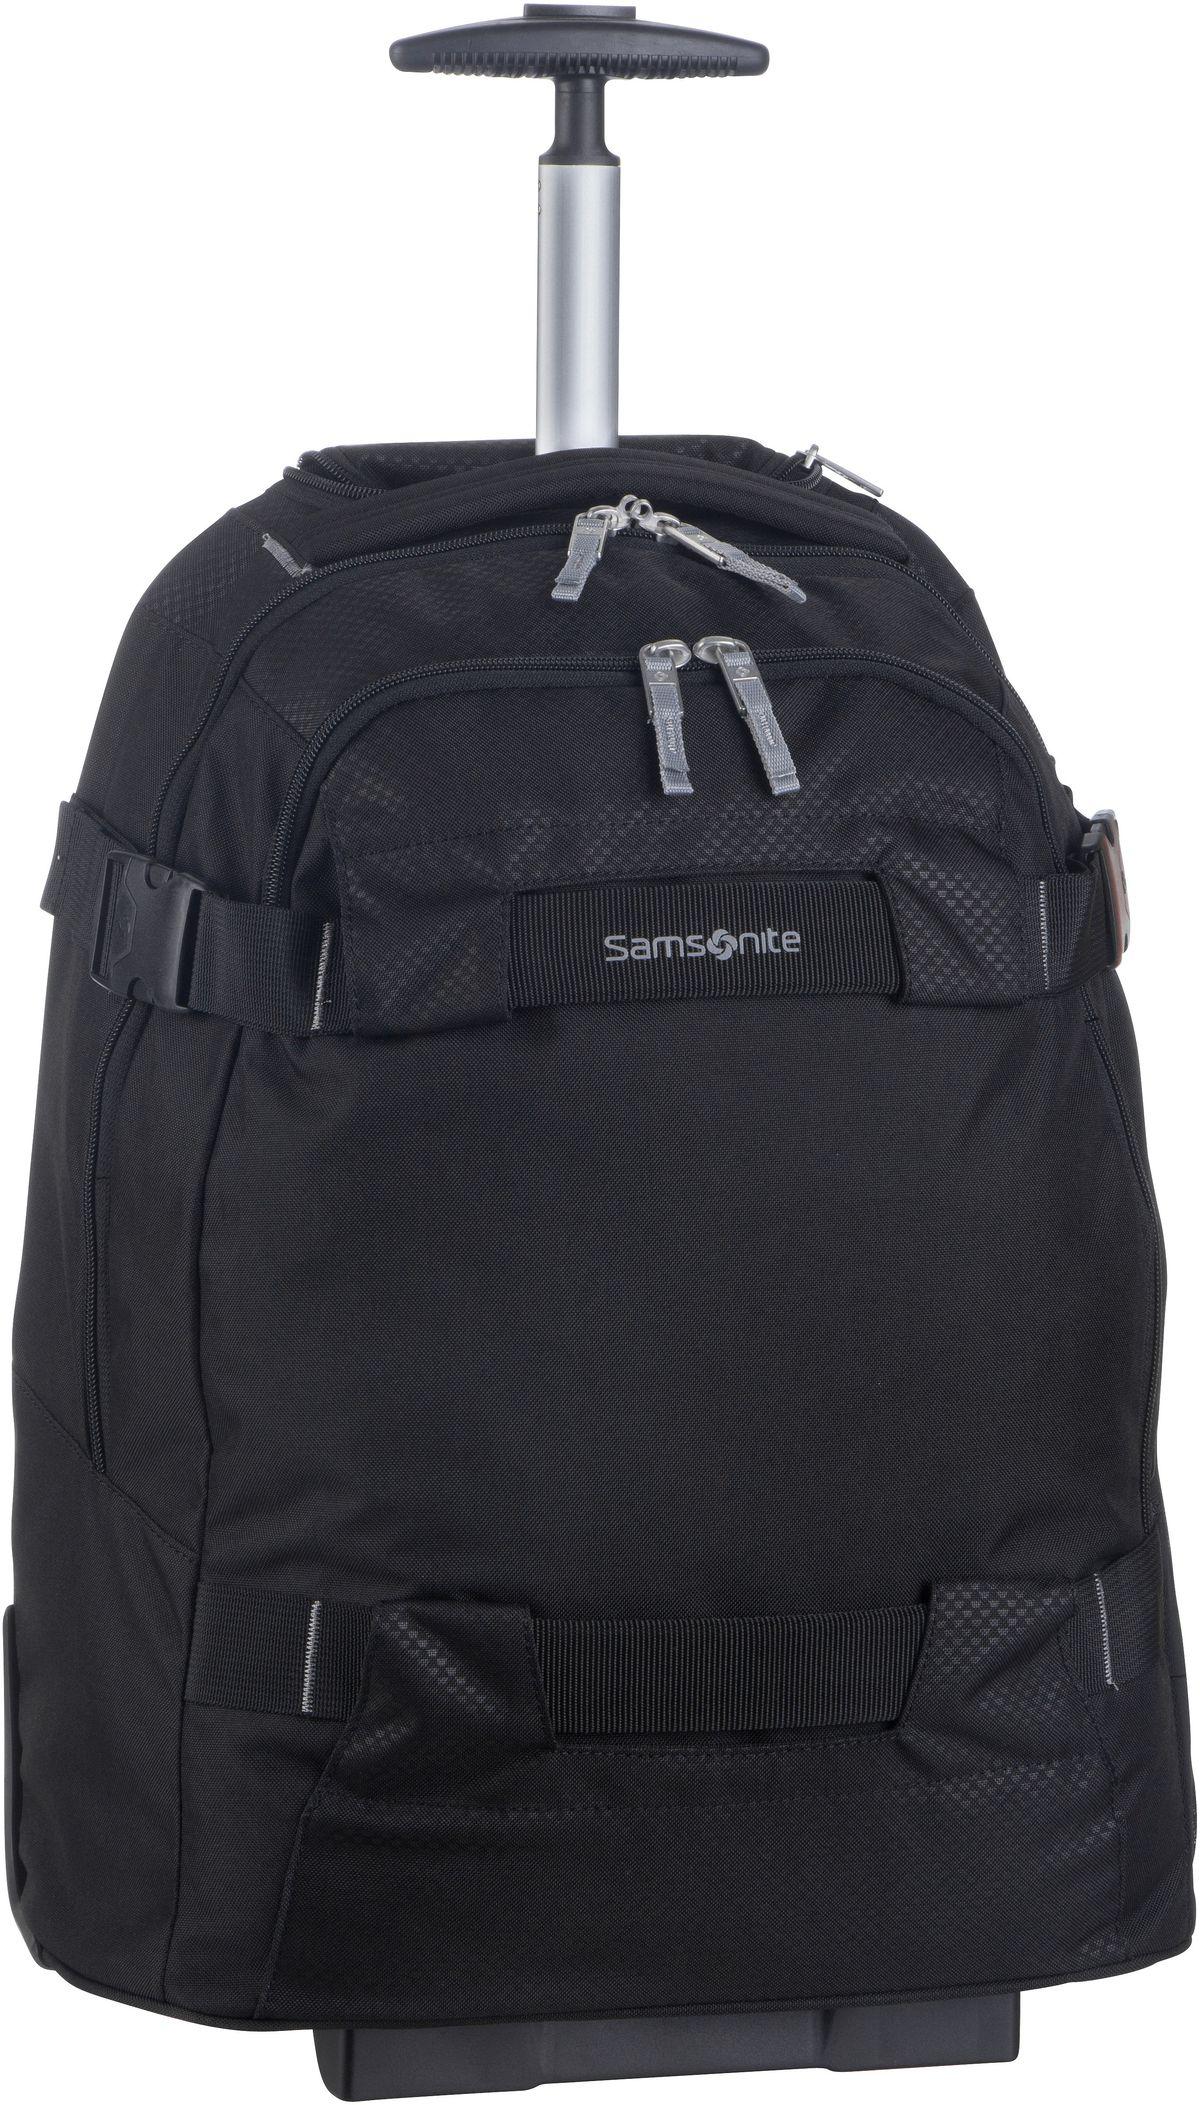 Rucksack-Trolley Sonora Laptop Backpack/Wh 55 Black (30 Liter)